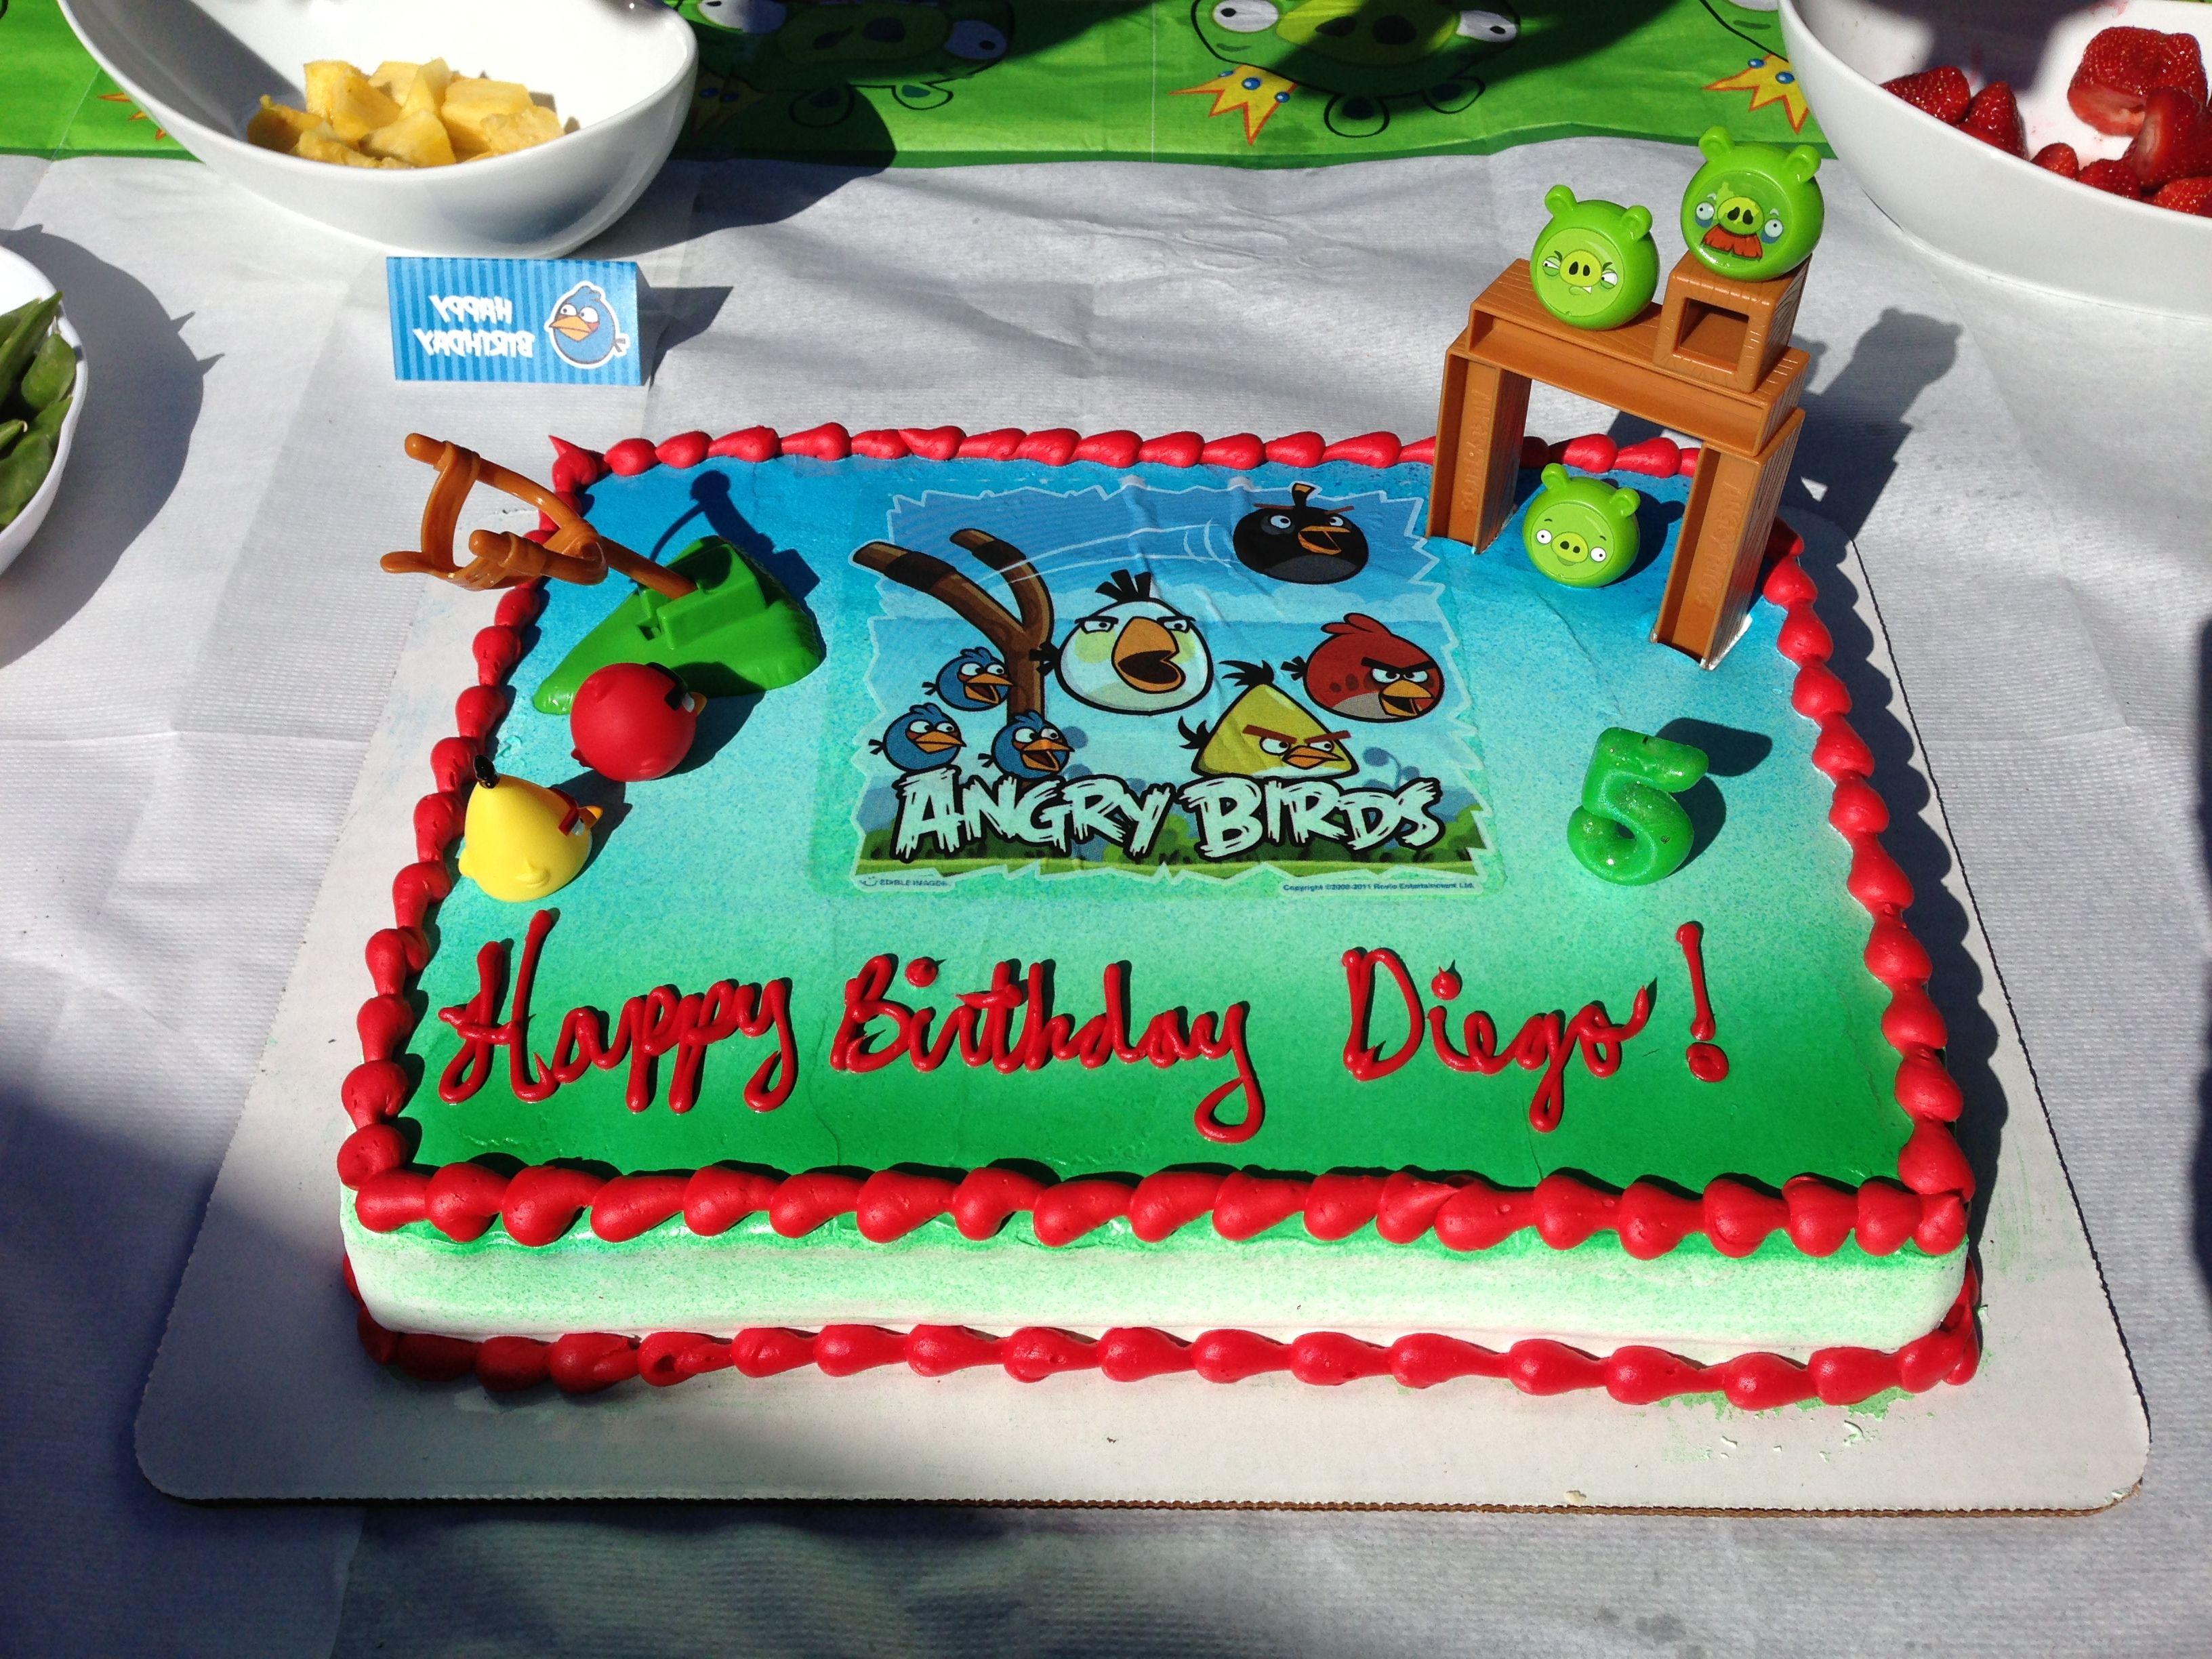 Easiest Angry Birds Cake Albertson S Cake Angry Bids Jenga Topper Bird Cakes Angry Birds Cake Cake